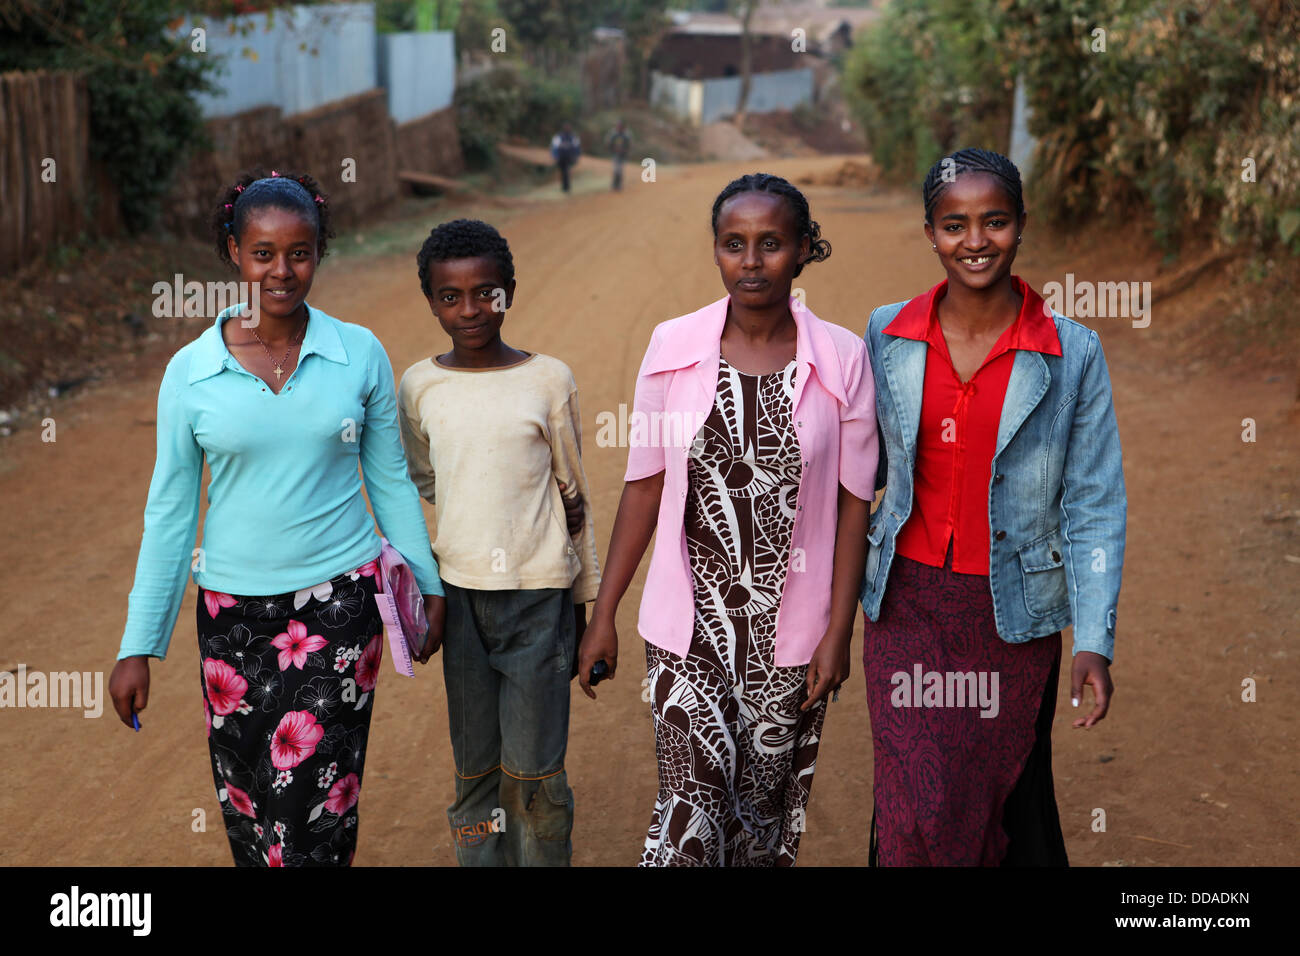 Daily life in Amboa, Western Ethiopia. - Stock Image